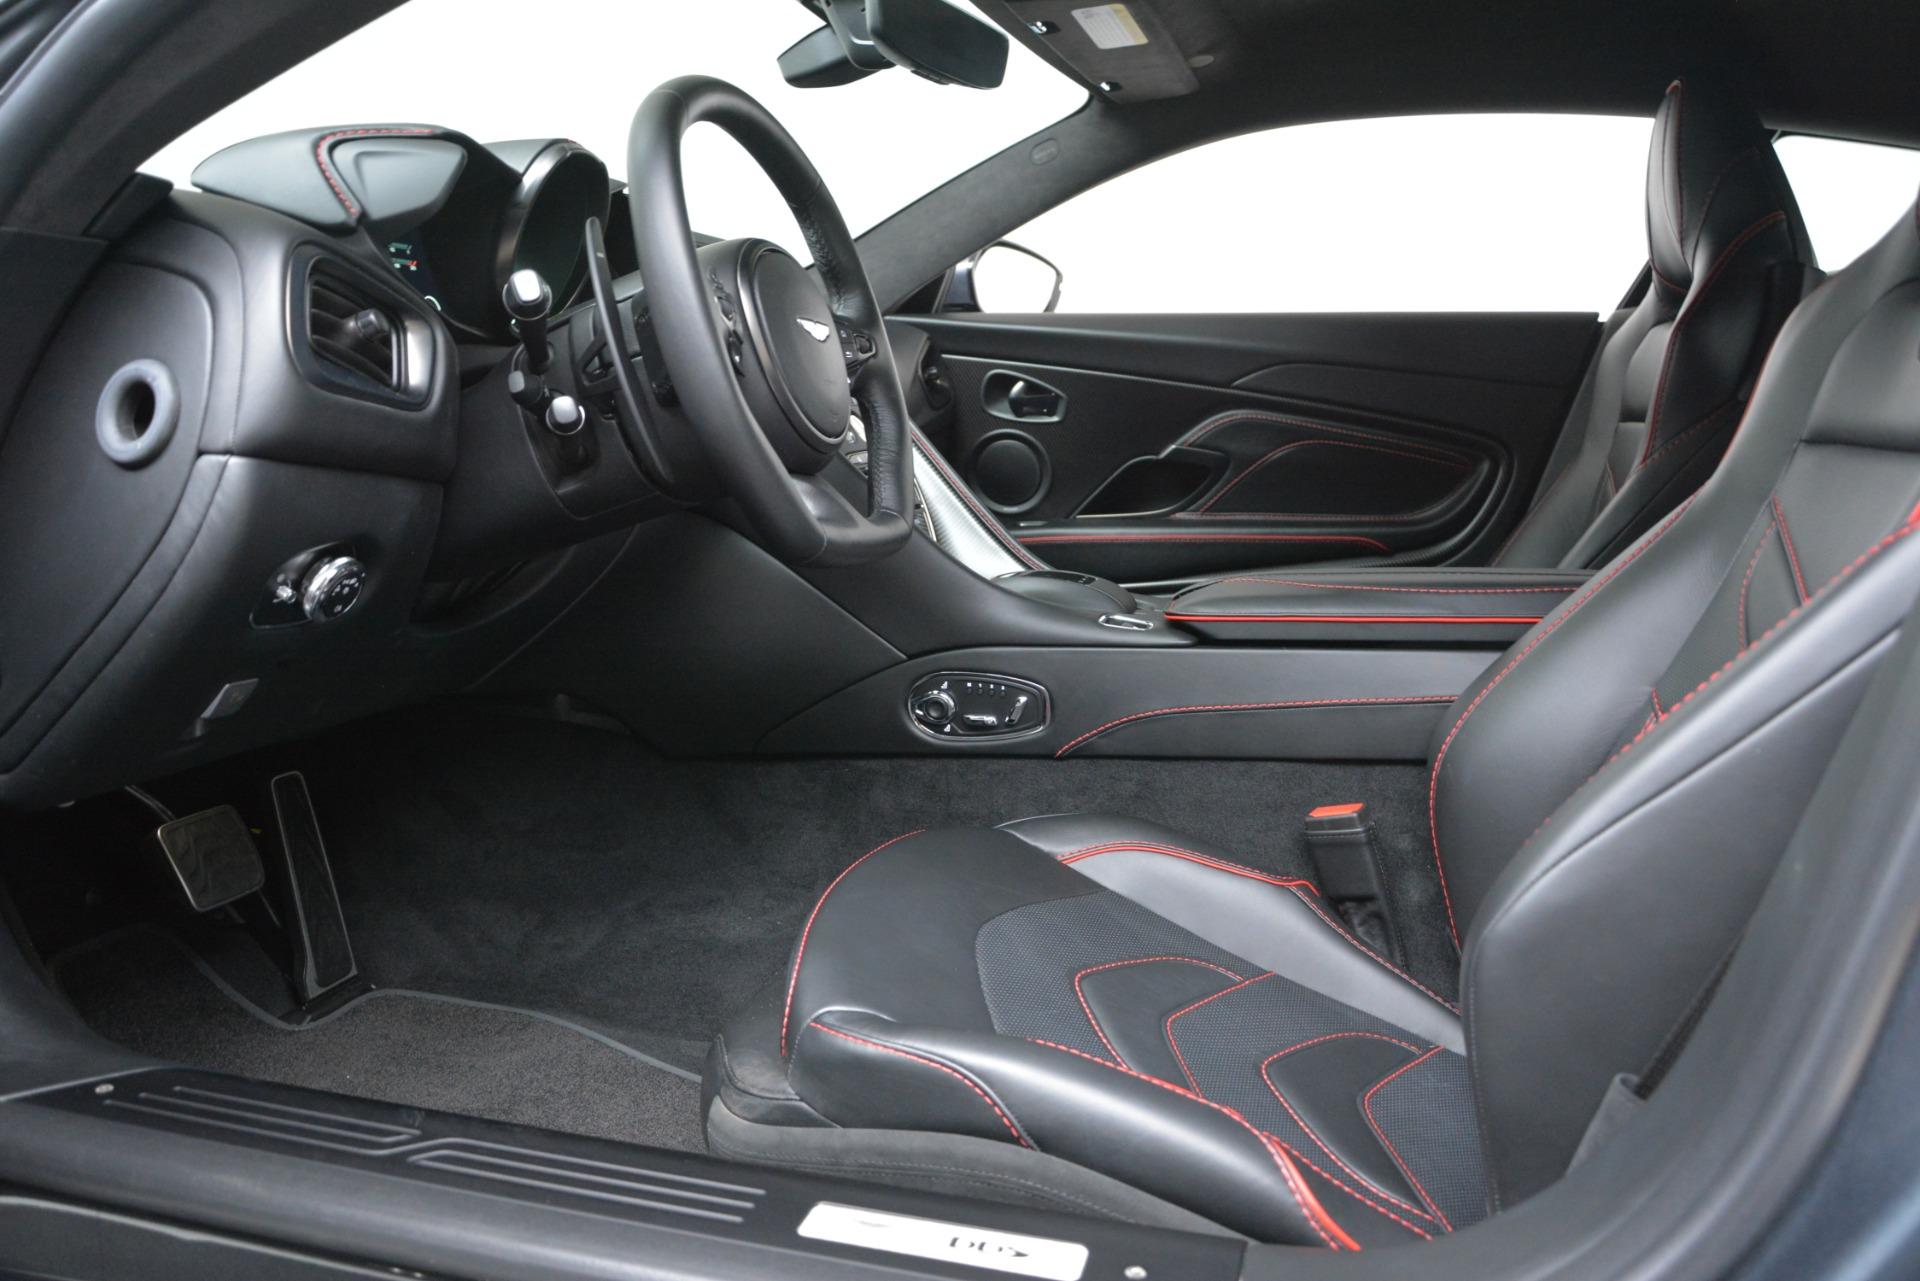 New 2019 Aston Martin DBS Superleggera For Sale In Westport, CT 3318_p12